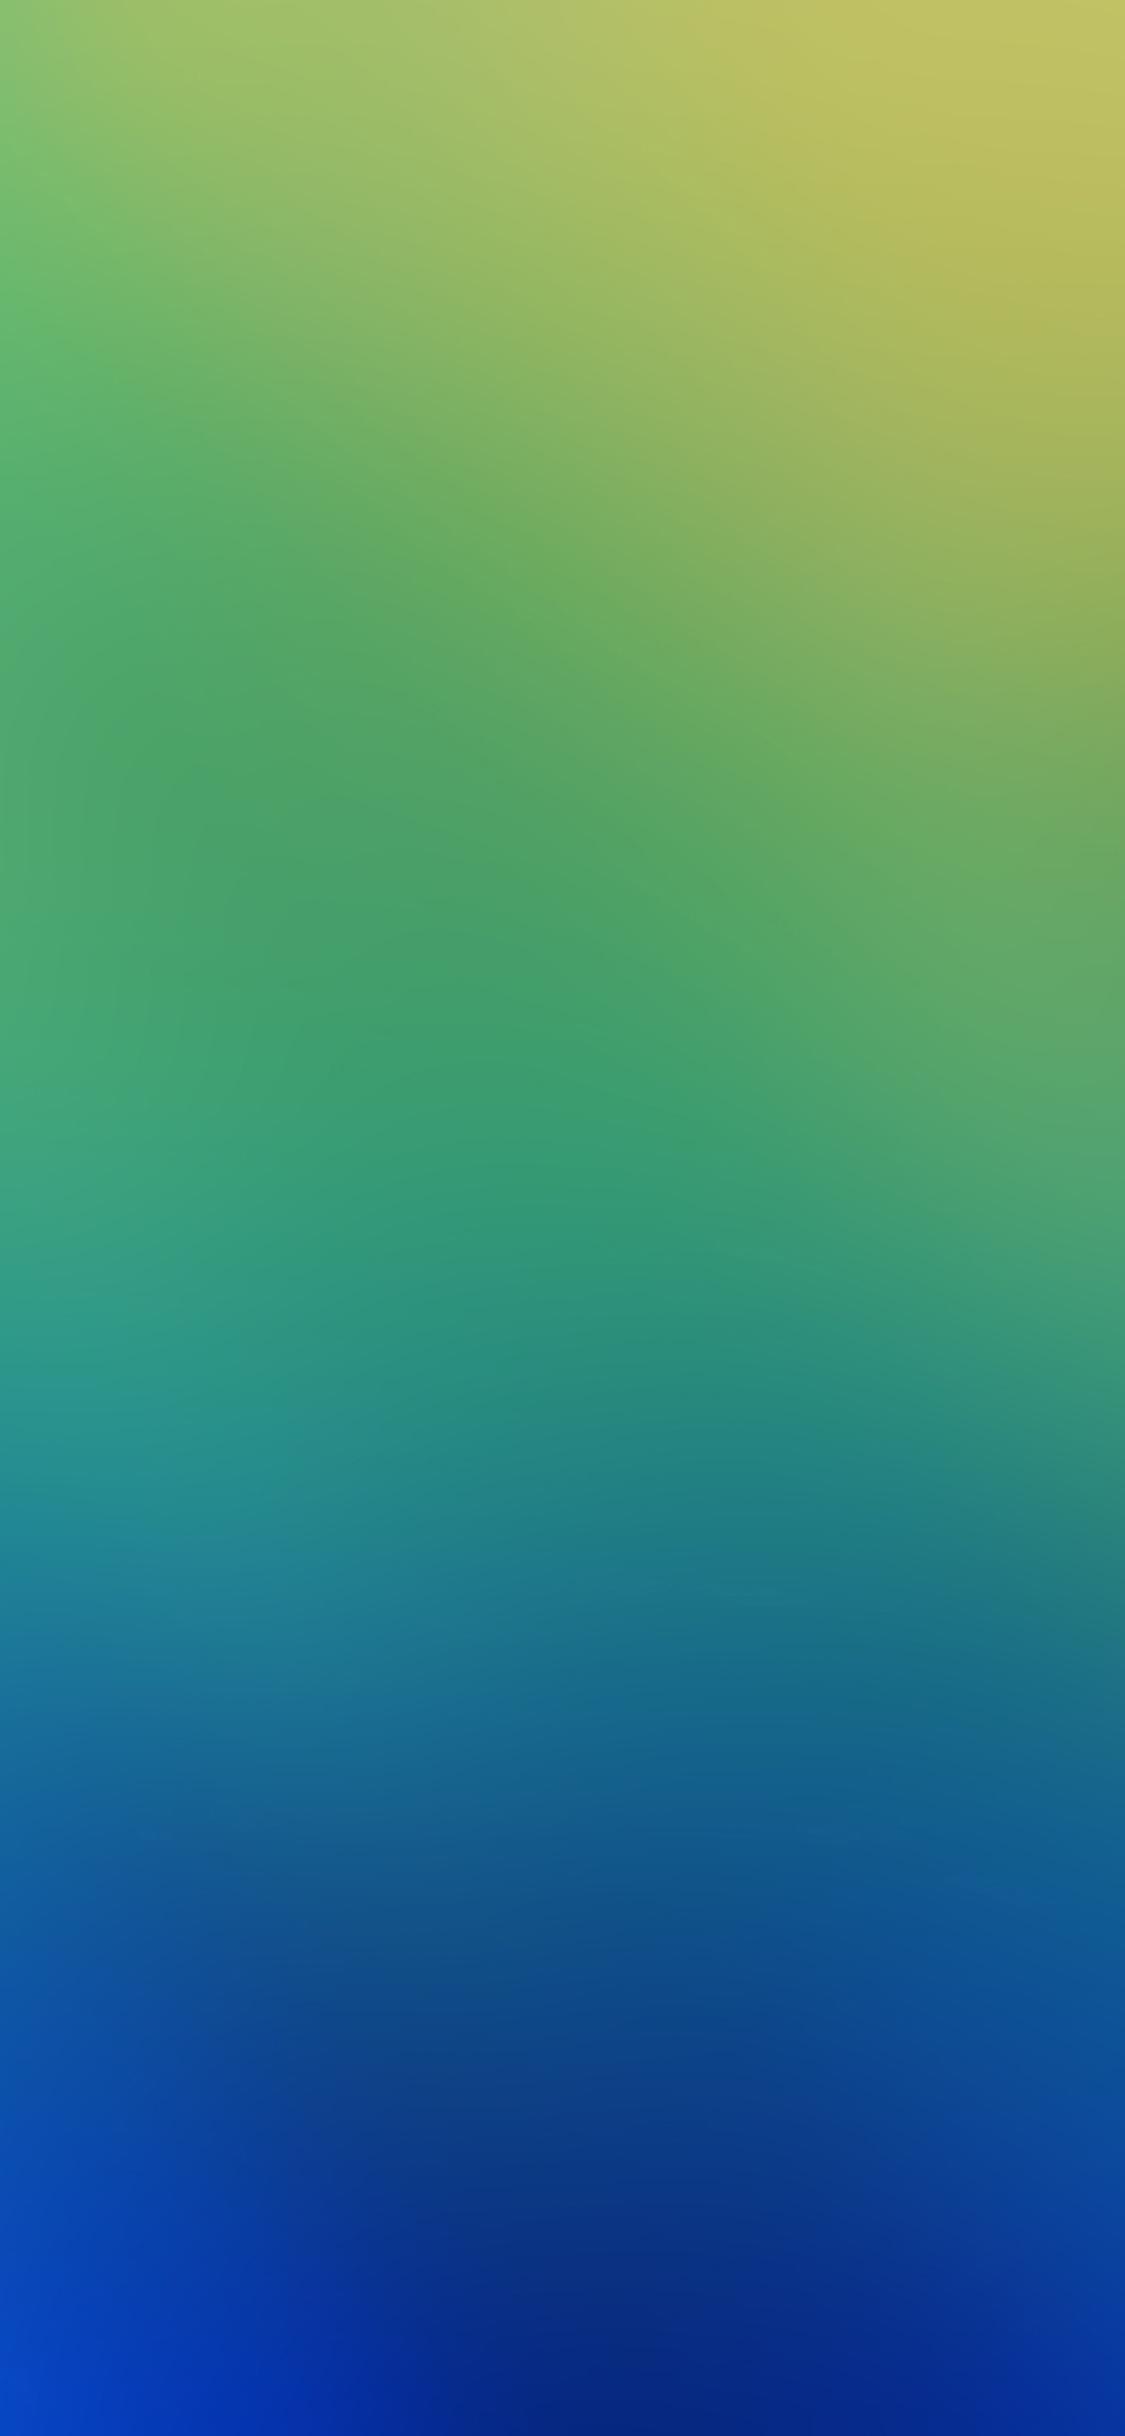 iPhoneXpapers.com-Apple-iPhone-wallpaper-sd63-diagonal-gravity-gradation-blur